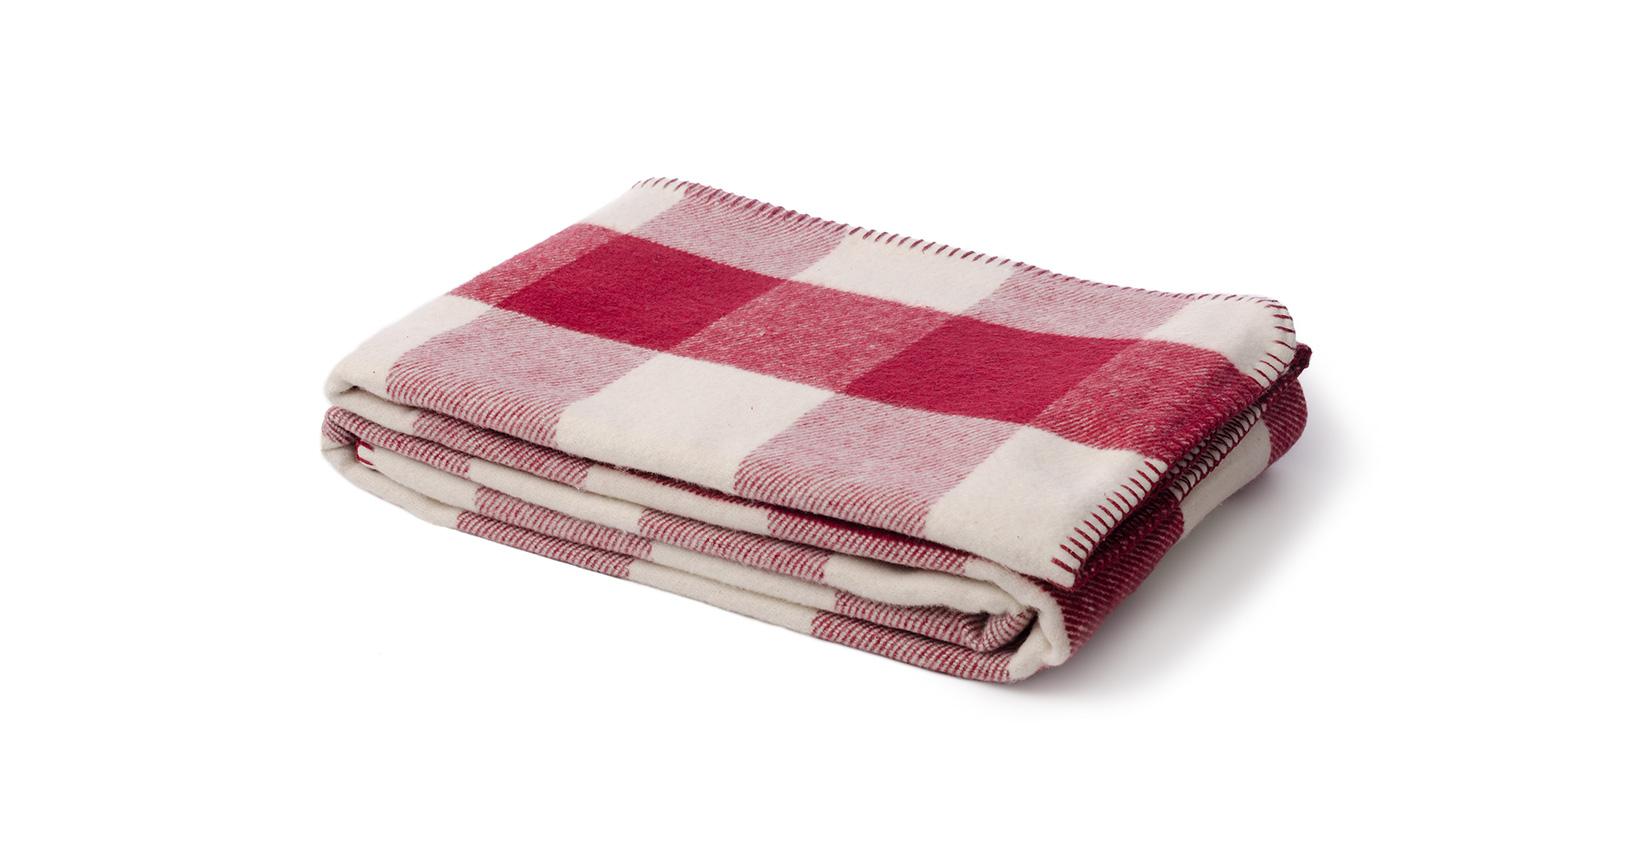 Blankets, cobertores - Romana